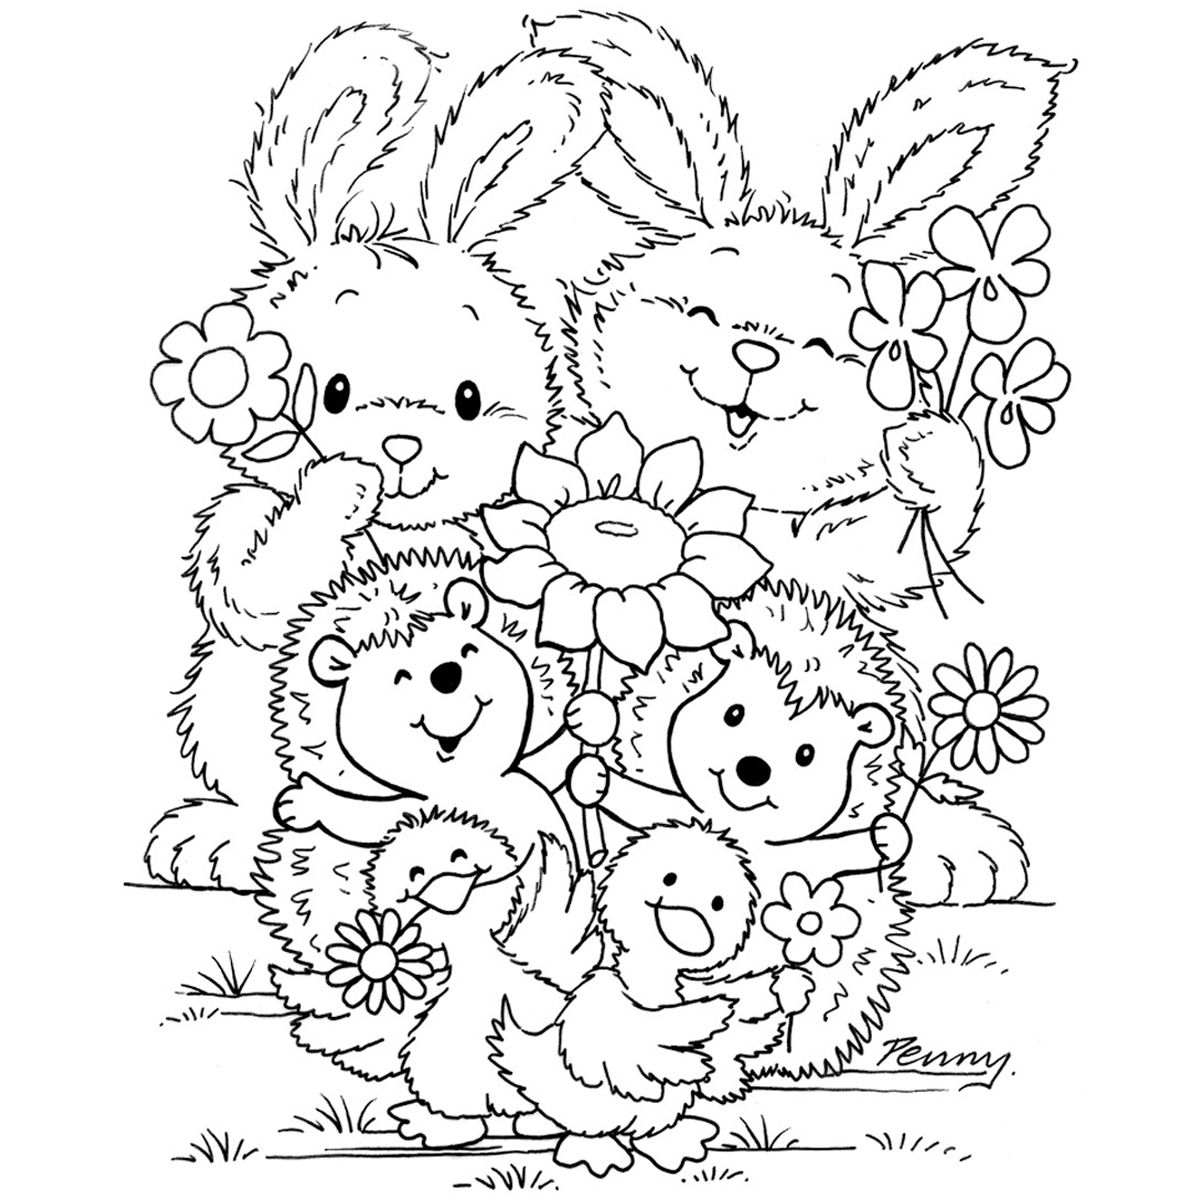 PJ - Flower Friends OPEN IMAGE ONLY IN NEW TAB OR IT WILL ...